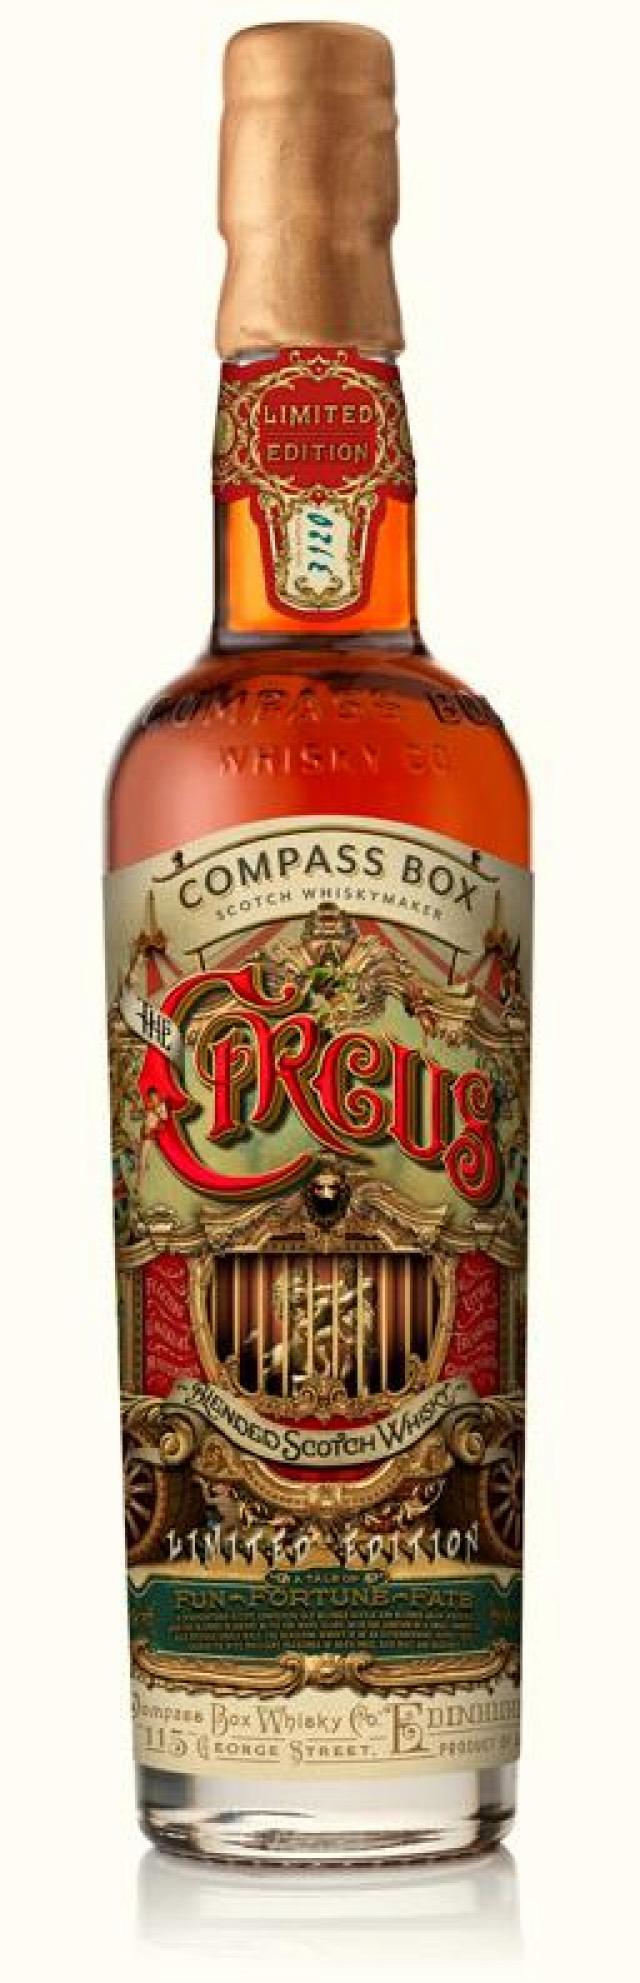 compass box whisk(e)y scotch whisky scotch whisky association